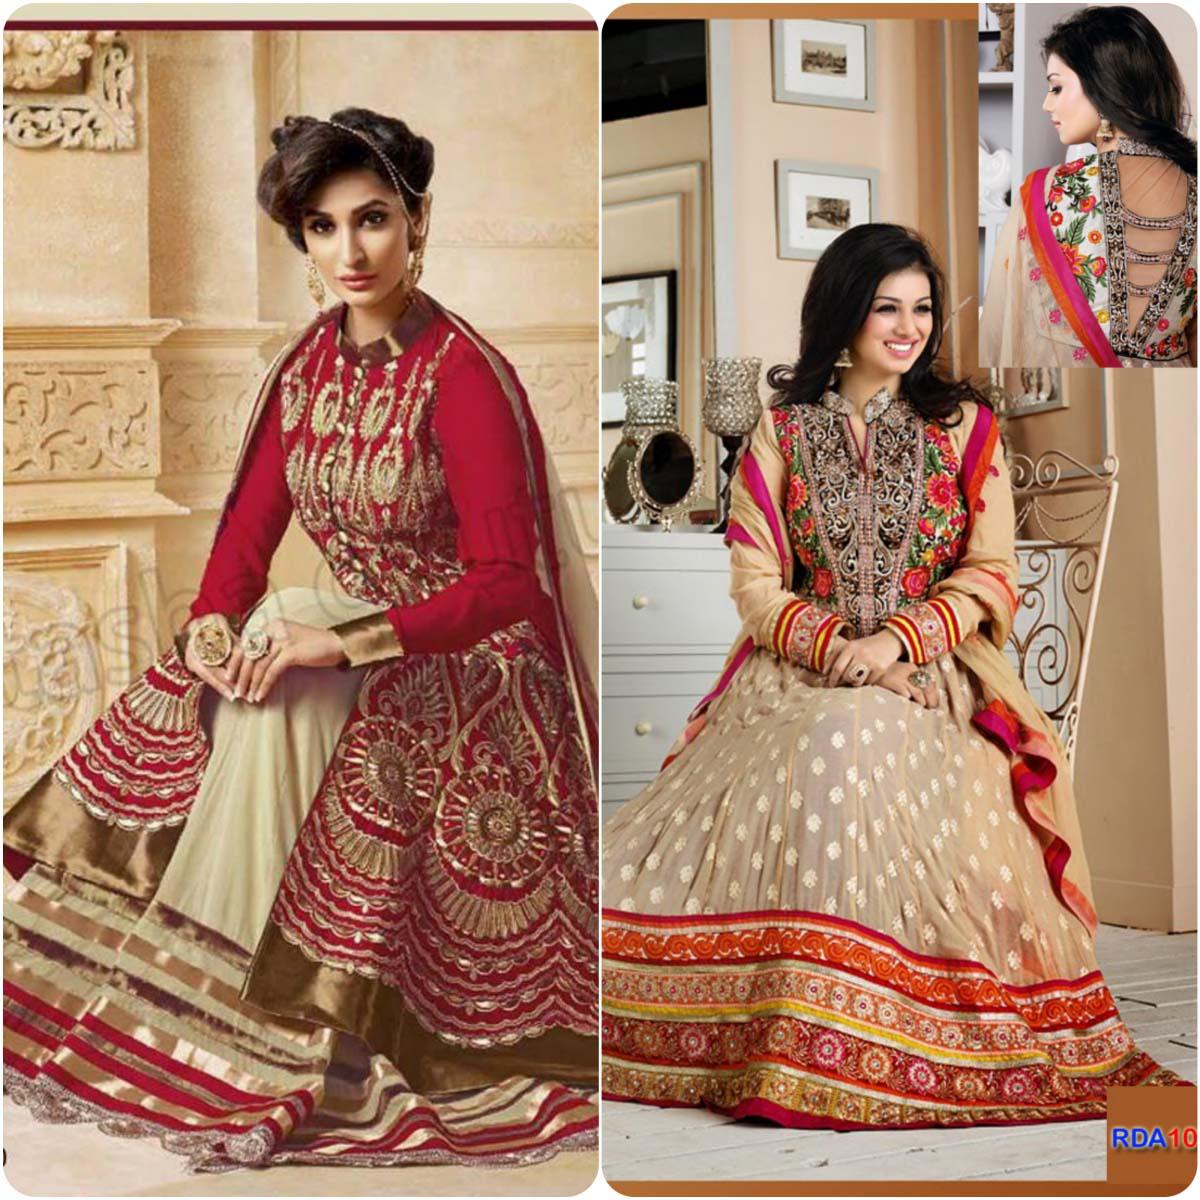 Natasha Couture Latest Indian Anarkali Dress Desigs Collection 2016-2017...styloplanet (12)